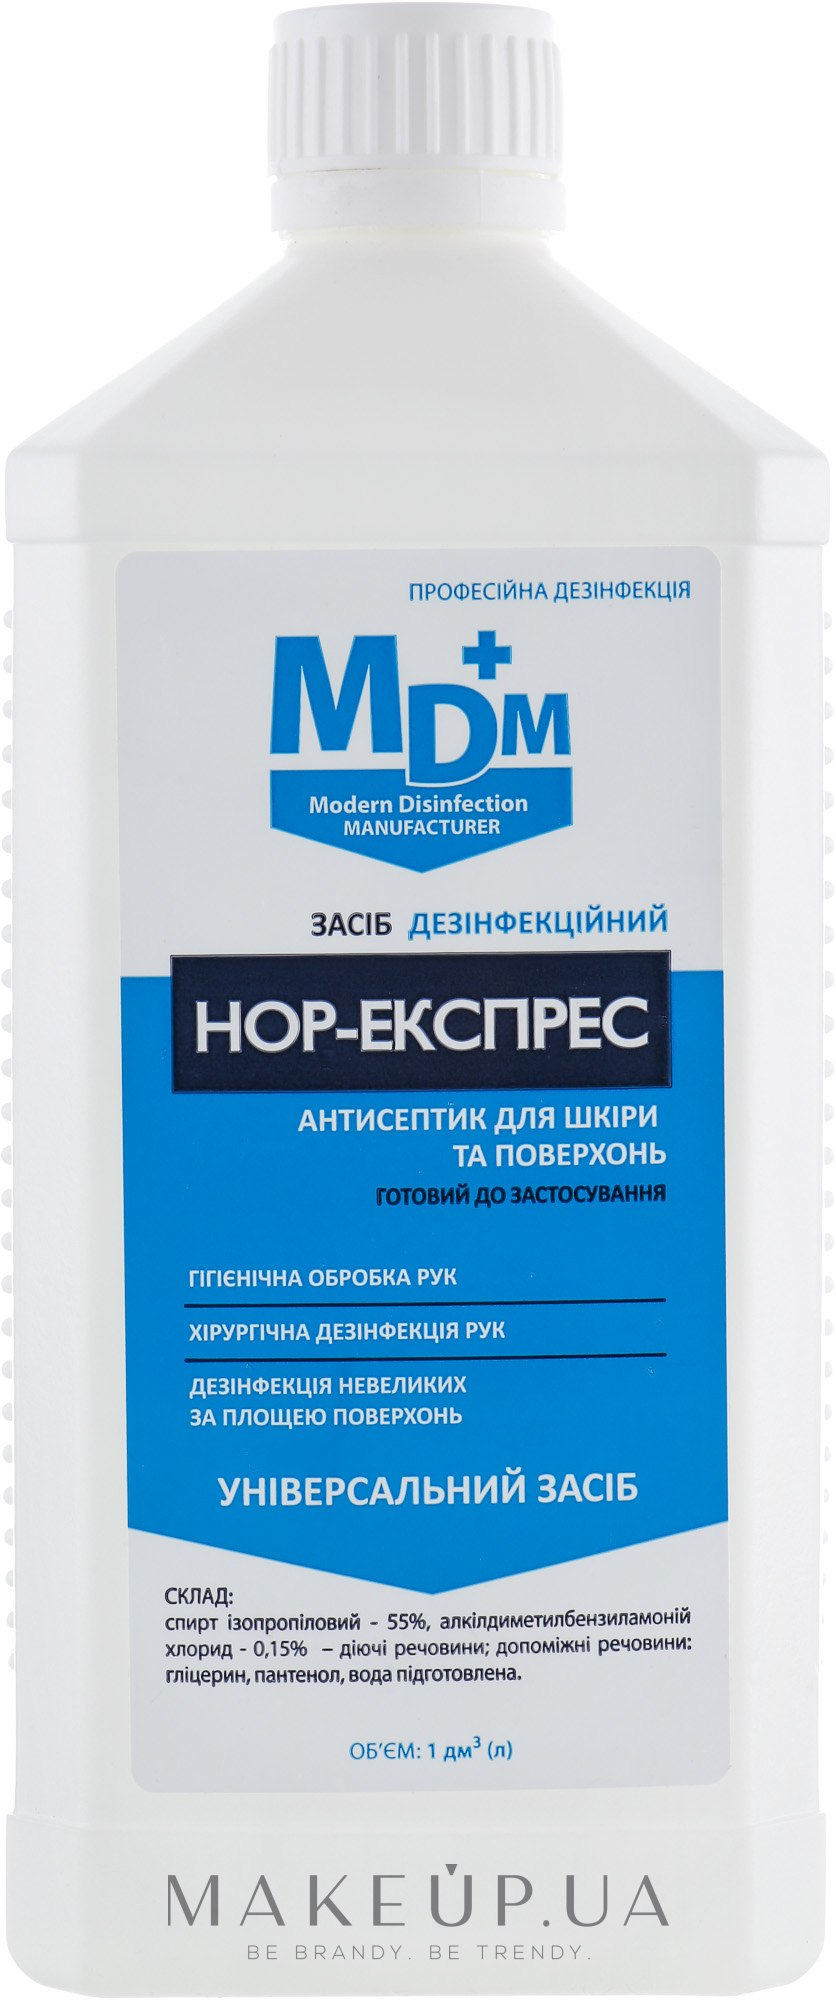 НОР-Експрес средство для дезинфекции рук и поверхностей - MDM — фото 1000ml